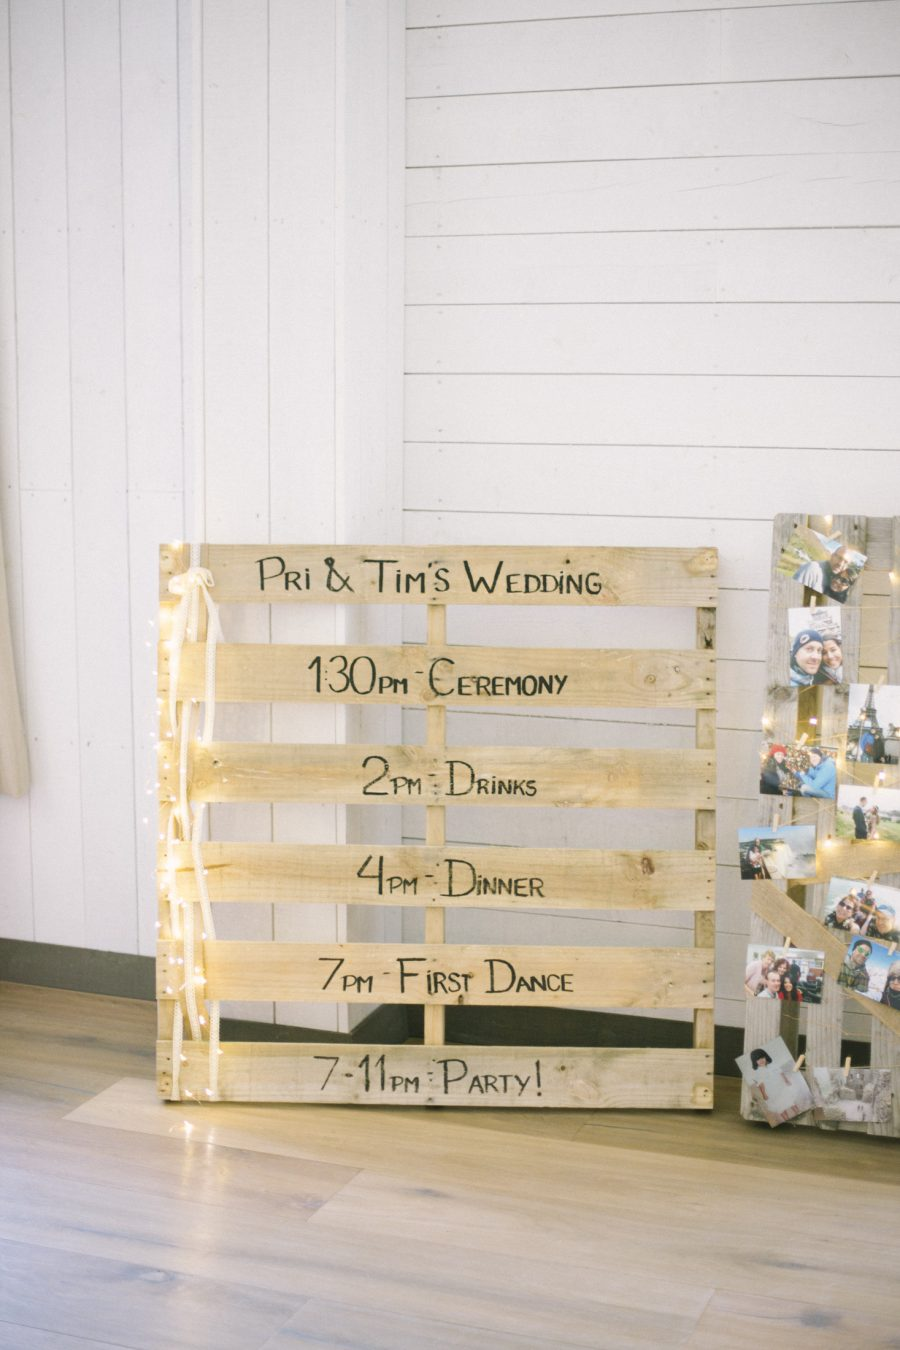 Scottish Rustic Wedding Ideas   Wedding Schedule on Palette   Scottish Barn Wedding   Barn at Barra Castle